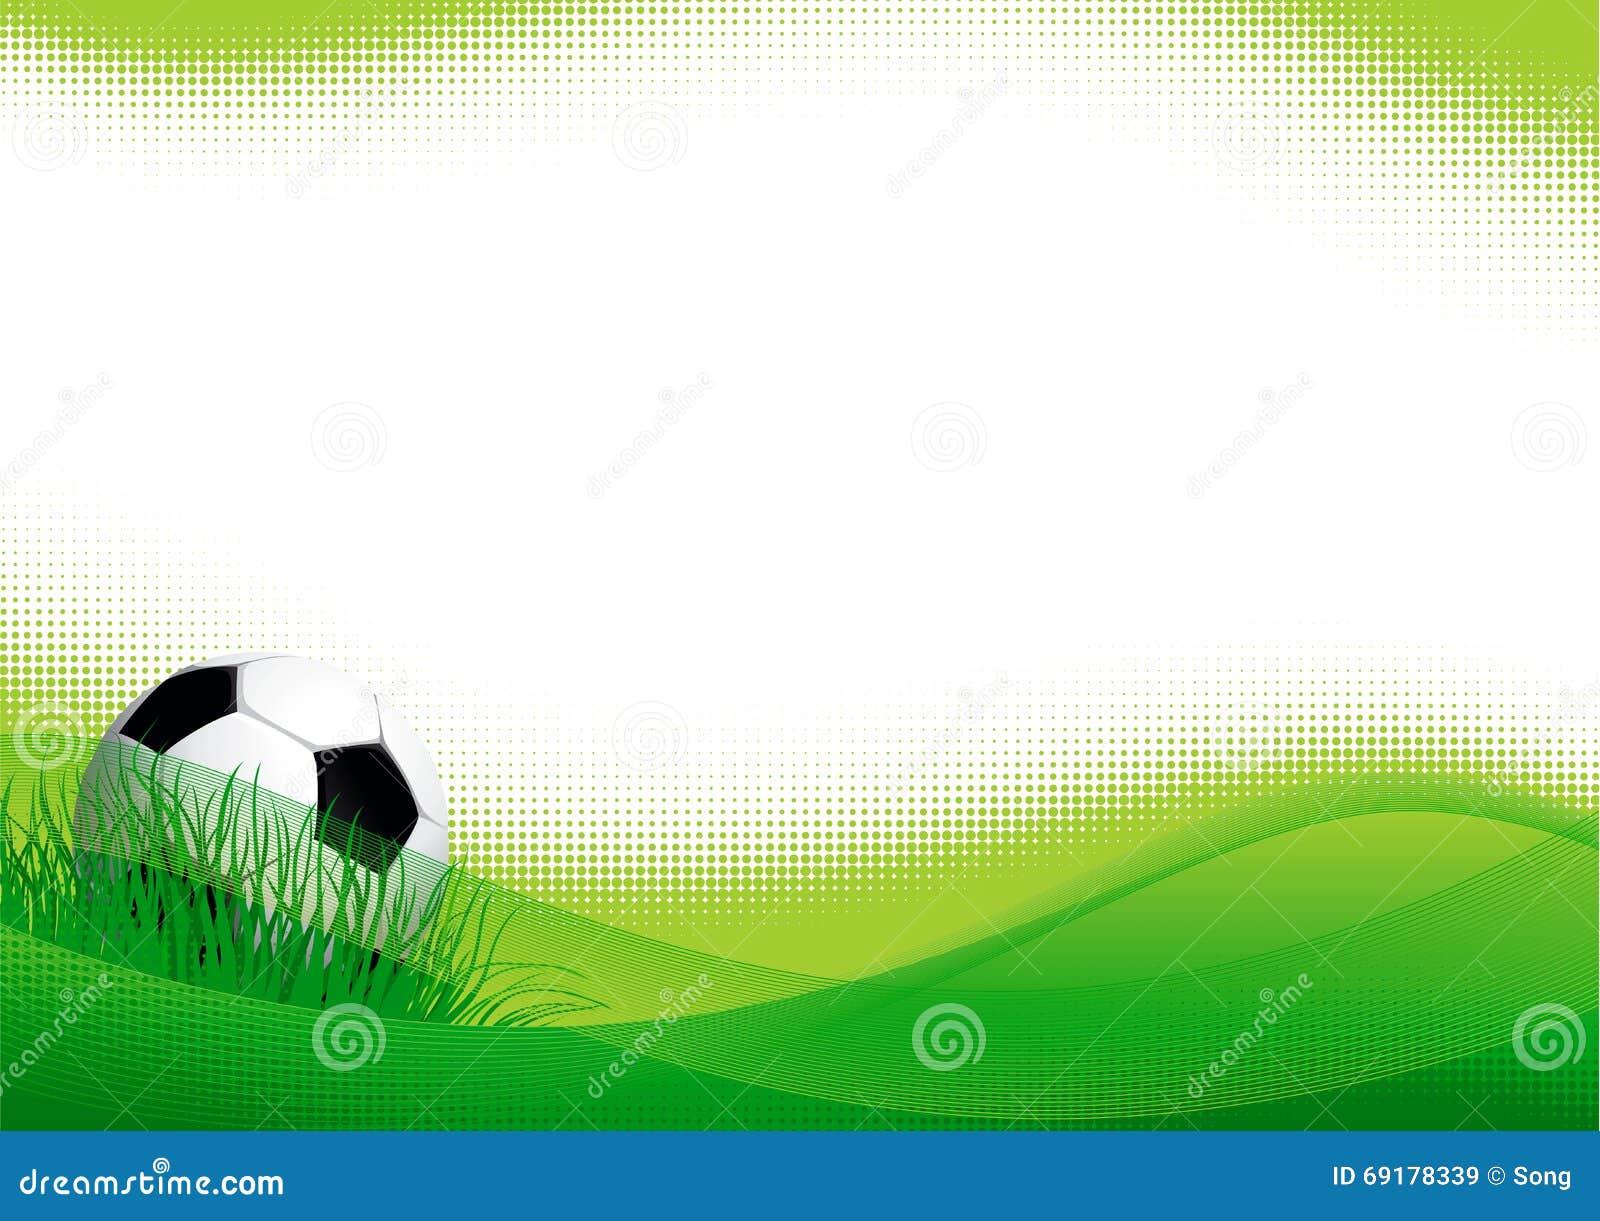 Sport Soccer Background Stock Vector - Image: 69178339